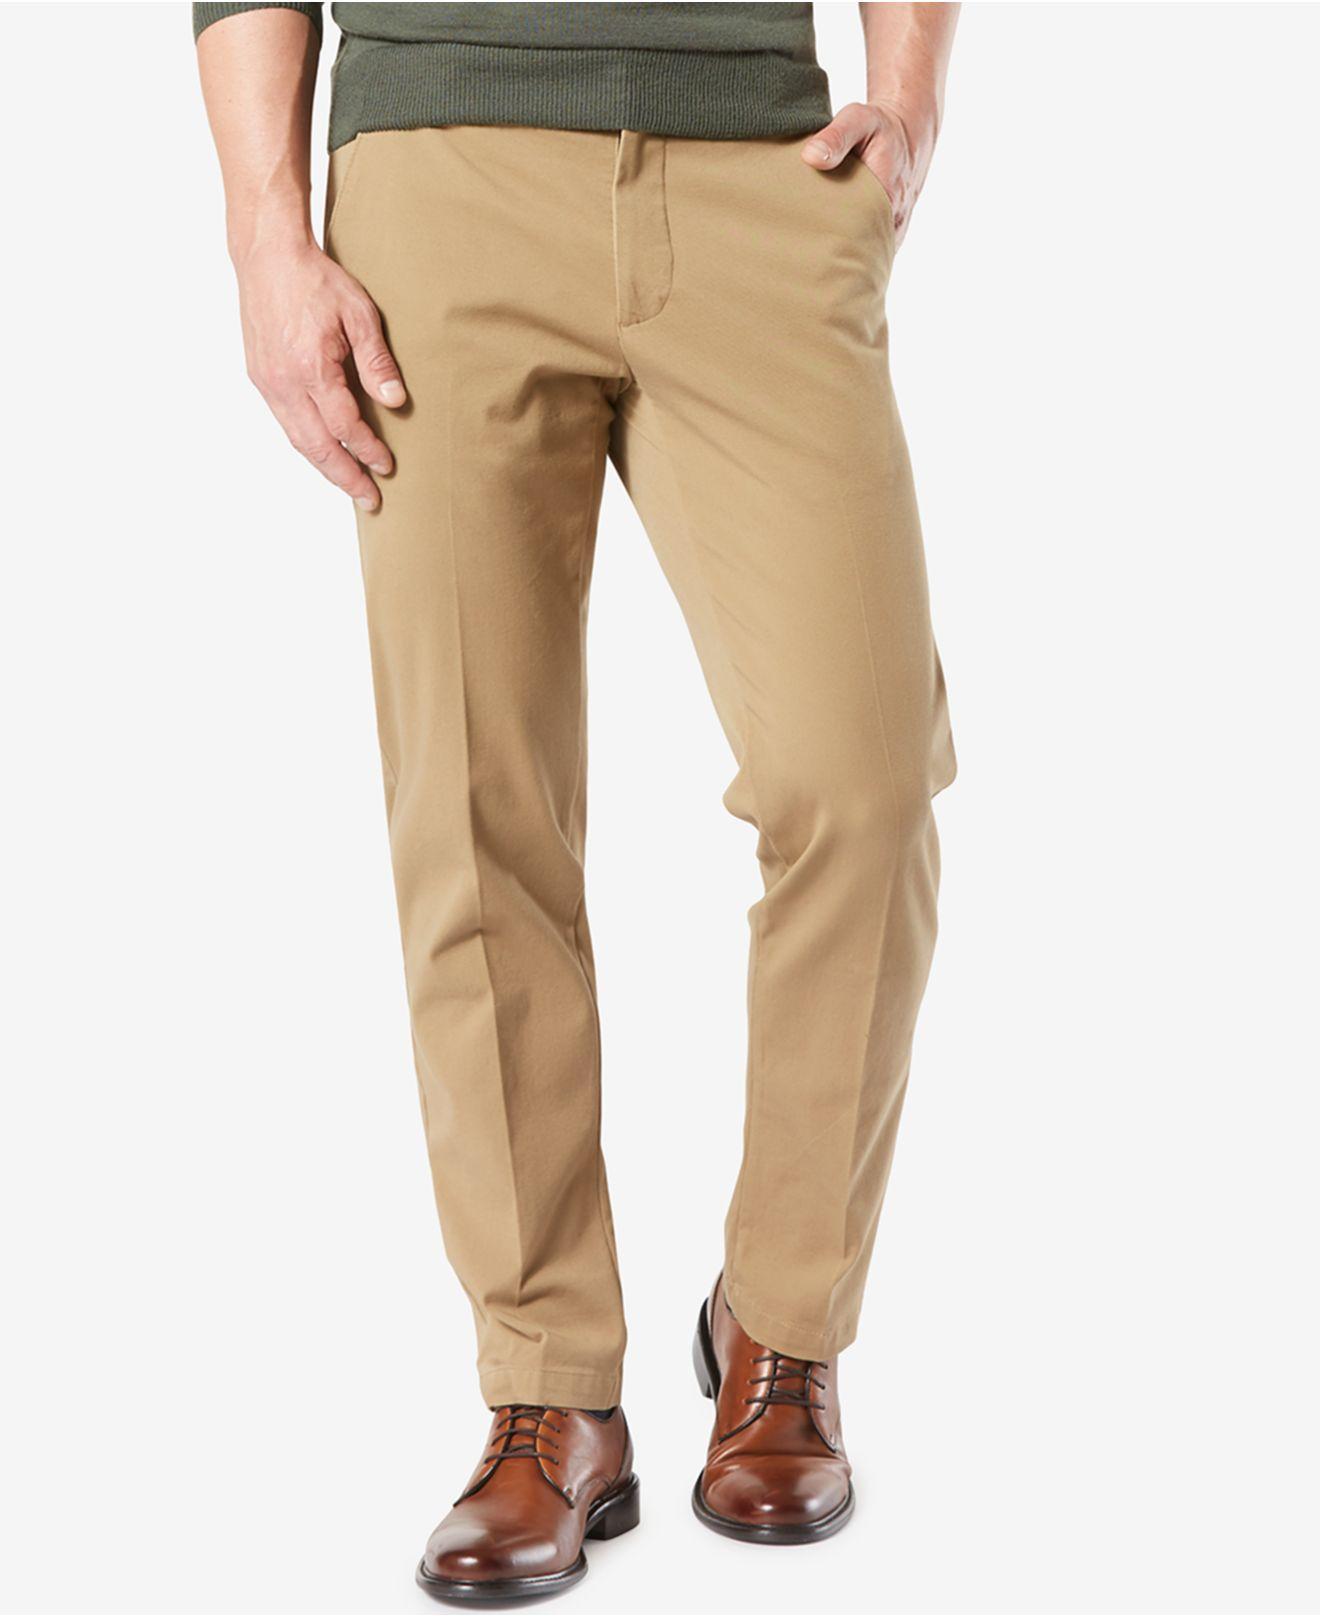 fc1654a53e Dockers. Men s Natural Workday Smart 360 Flex Straight Fit Khaki Stretch  Pants D2